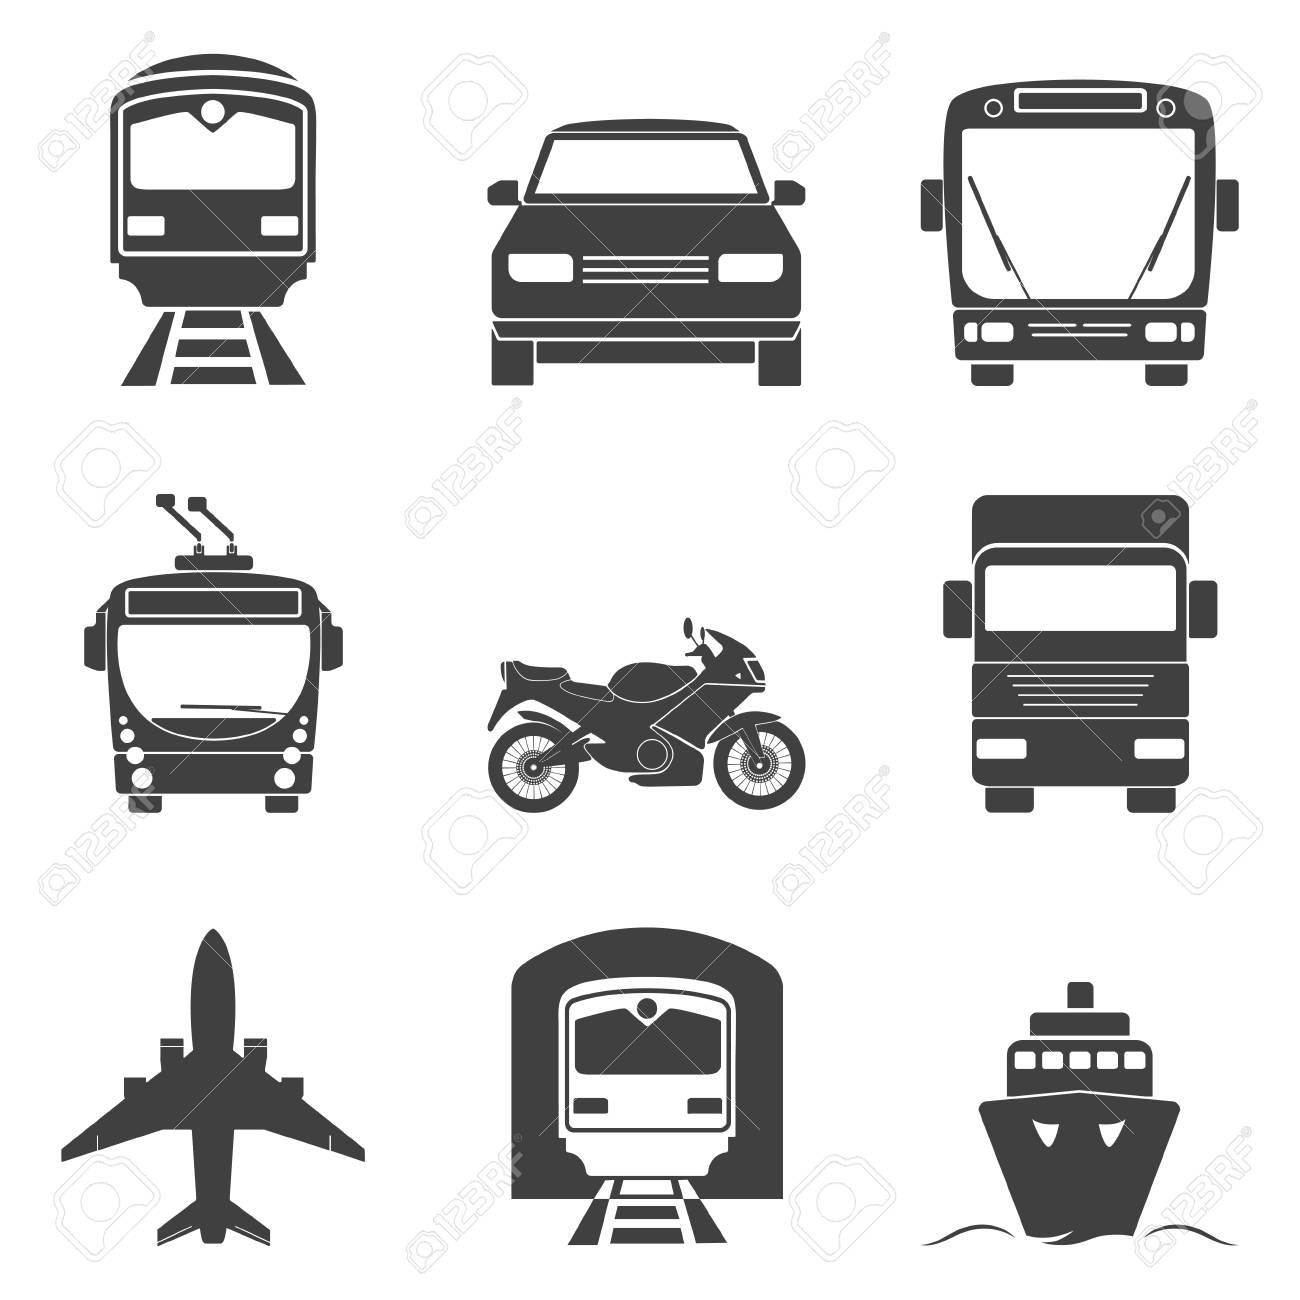 Simple monochromatic transport icons set. - 43670311